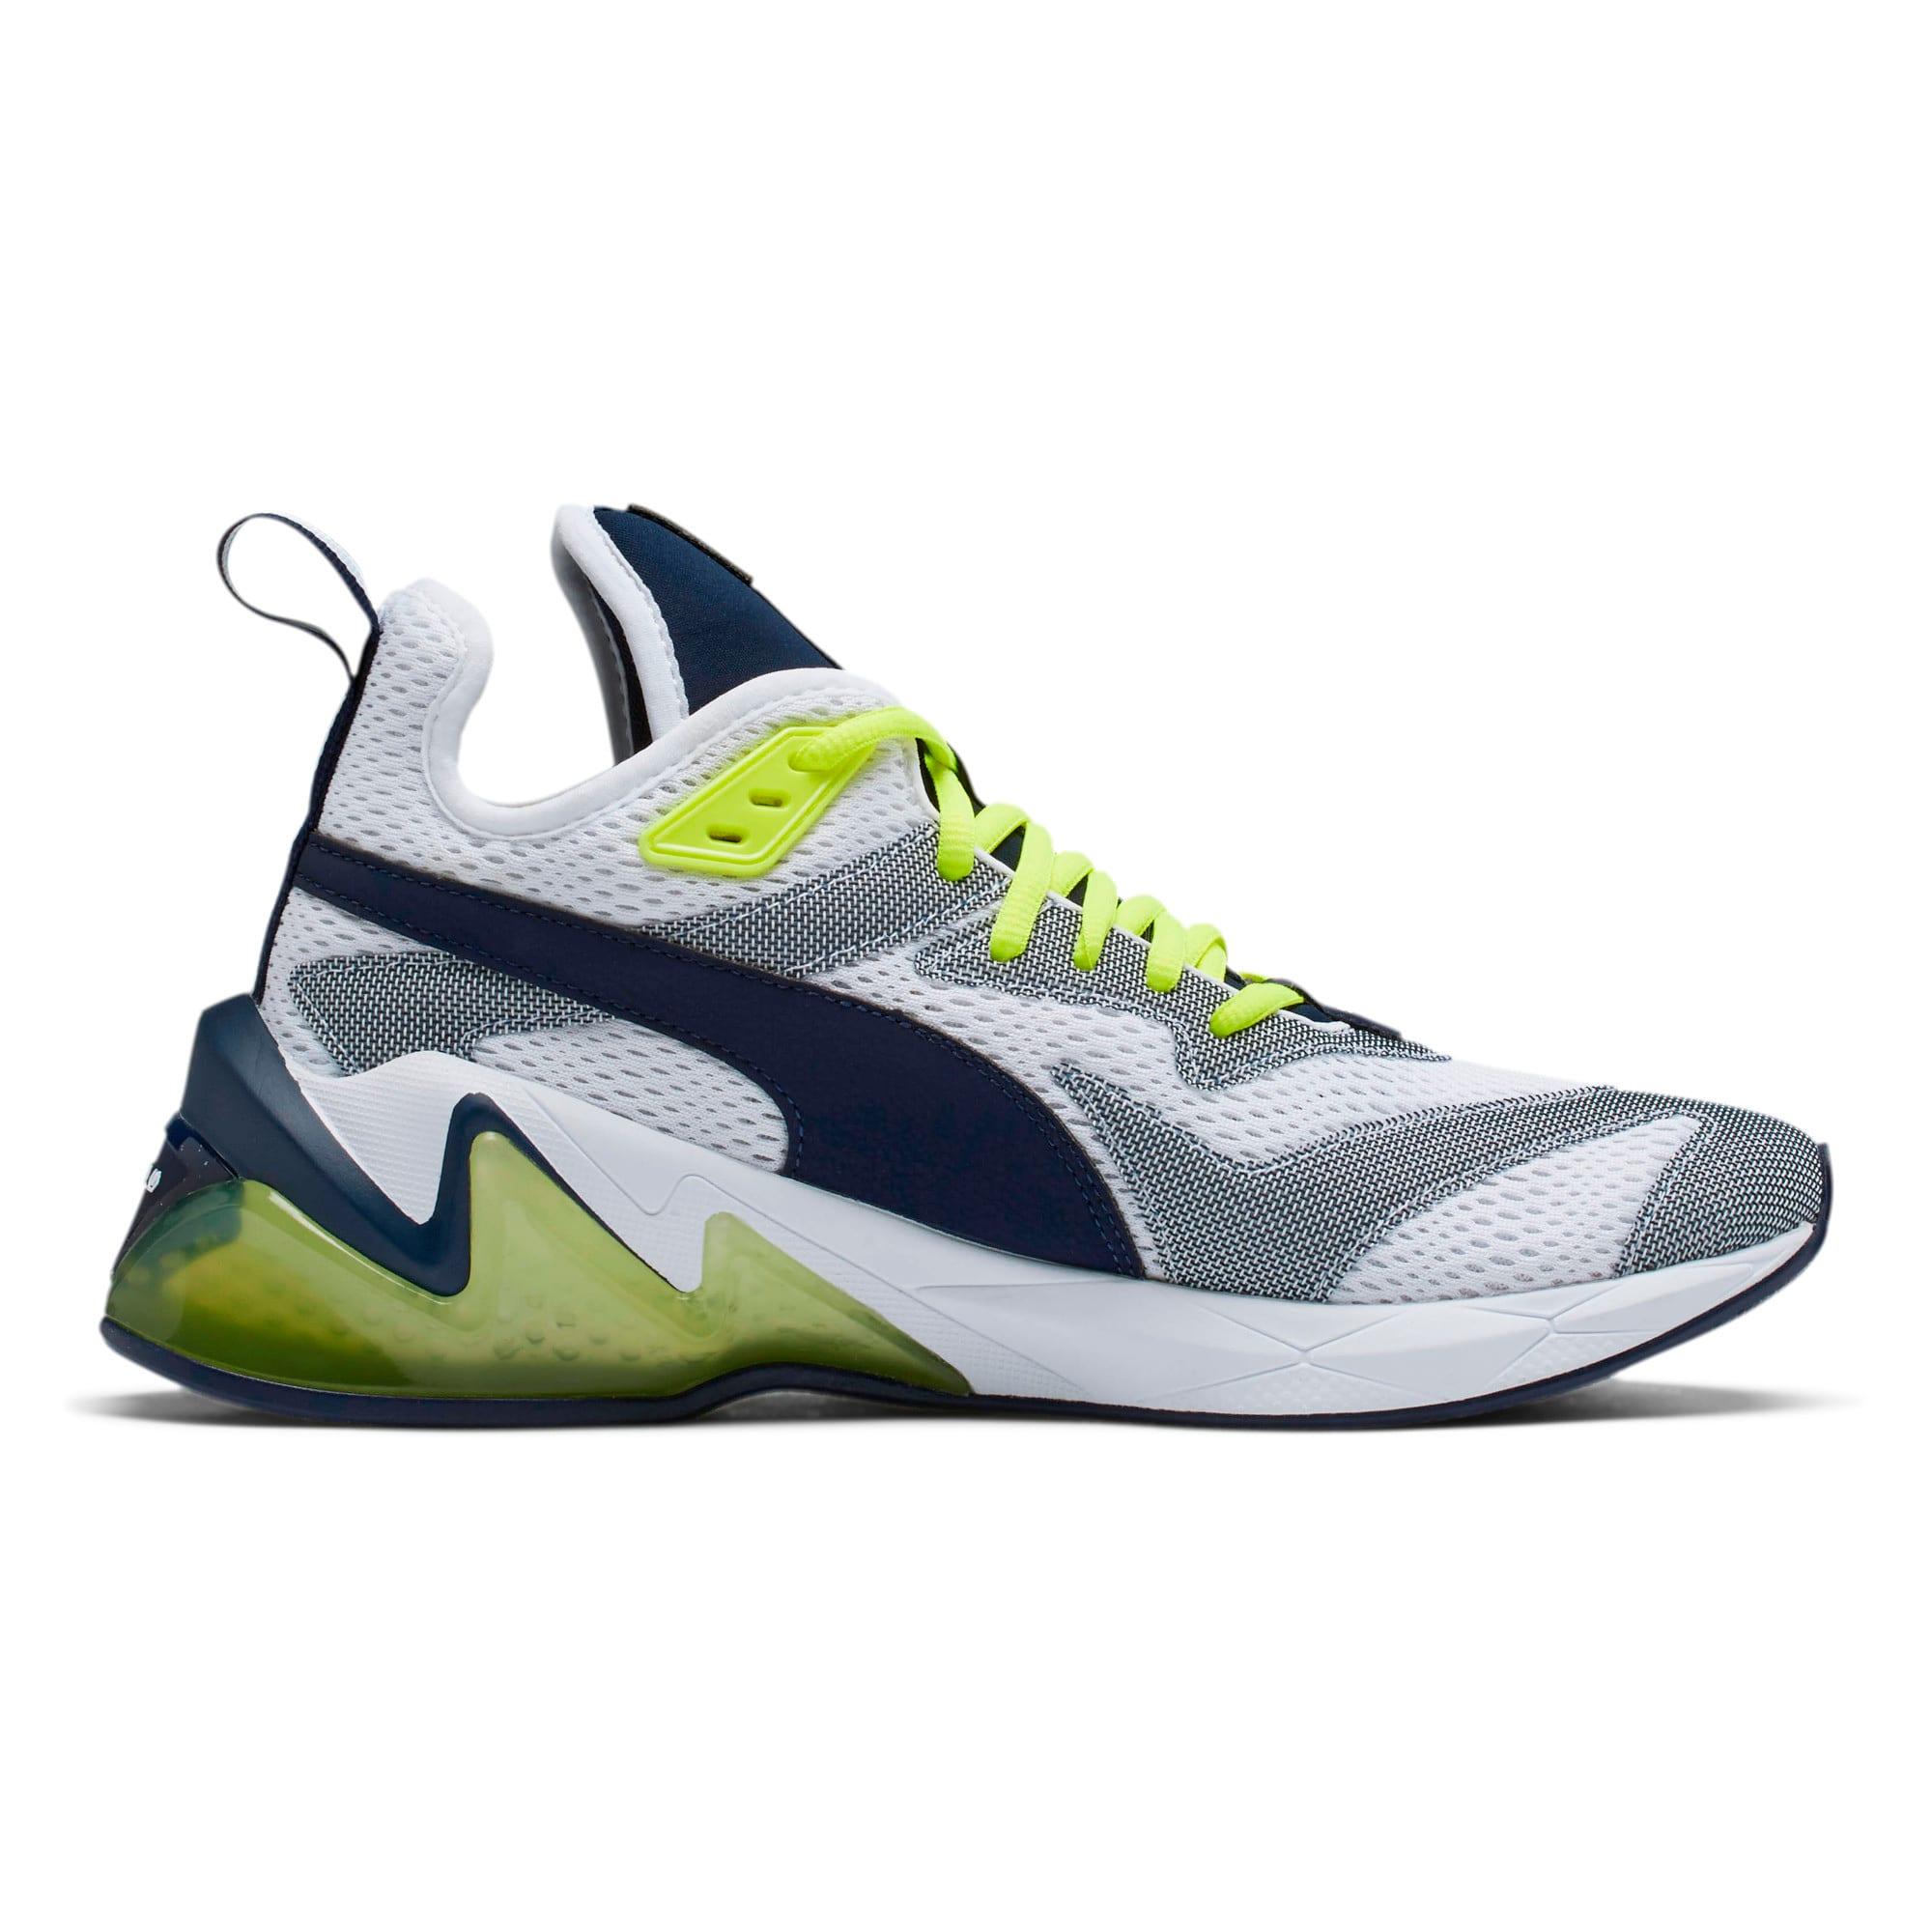 Thumbnail 6 of LQDCELL Origin Tech Men's Training Shoes, Puma White-Peacoat, medium